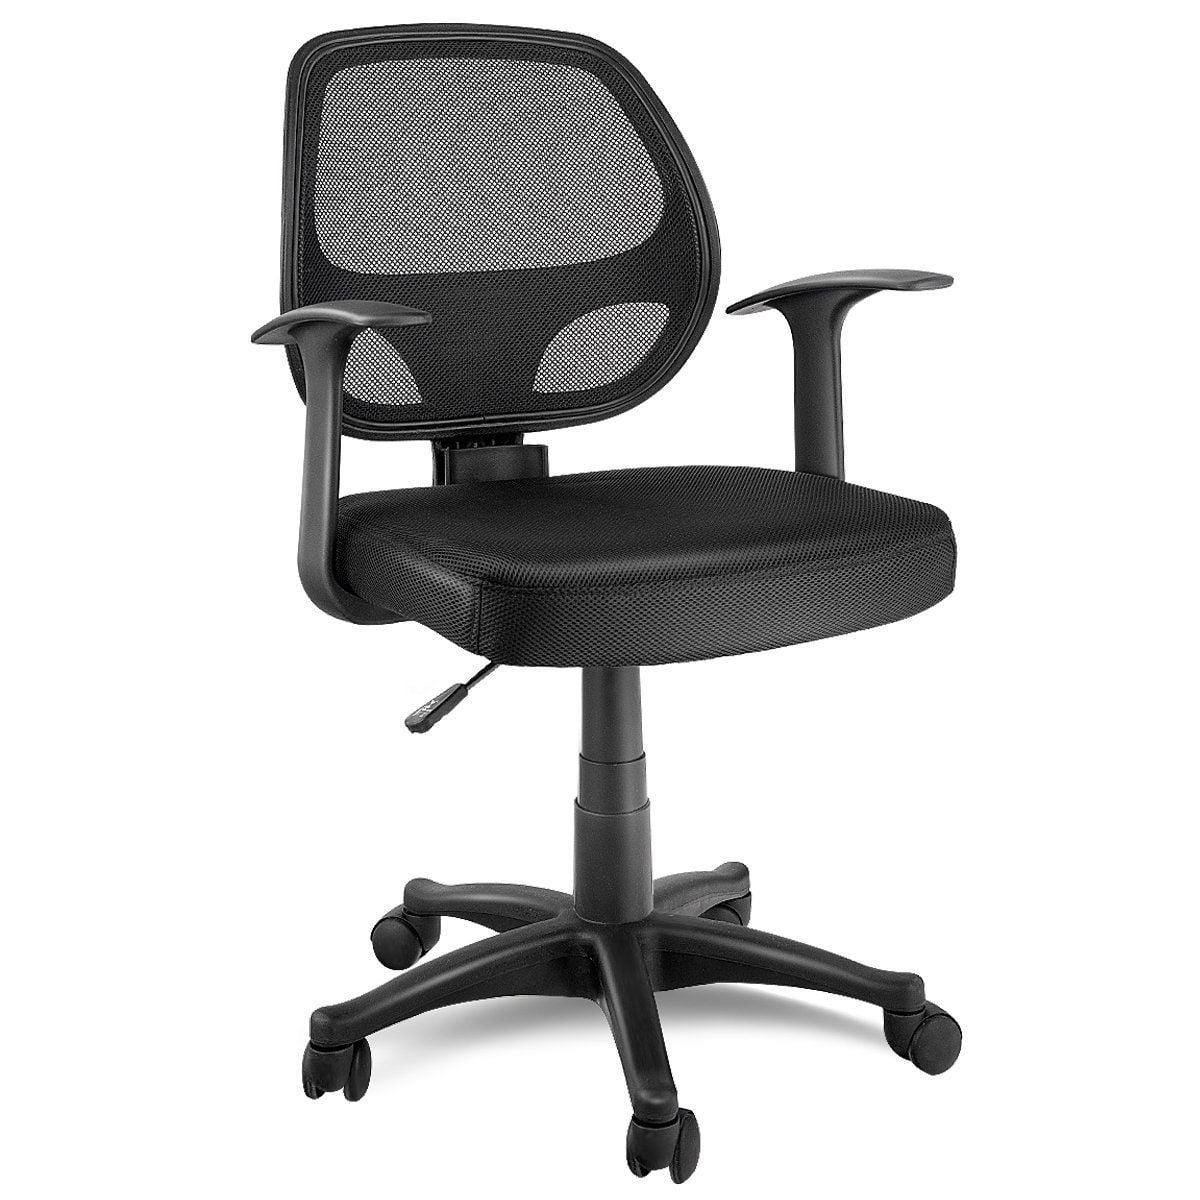 New Adjustable Ergonomic Mesh Swivel Computer Office Desk Durable Task Chair